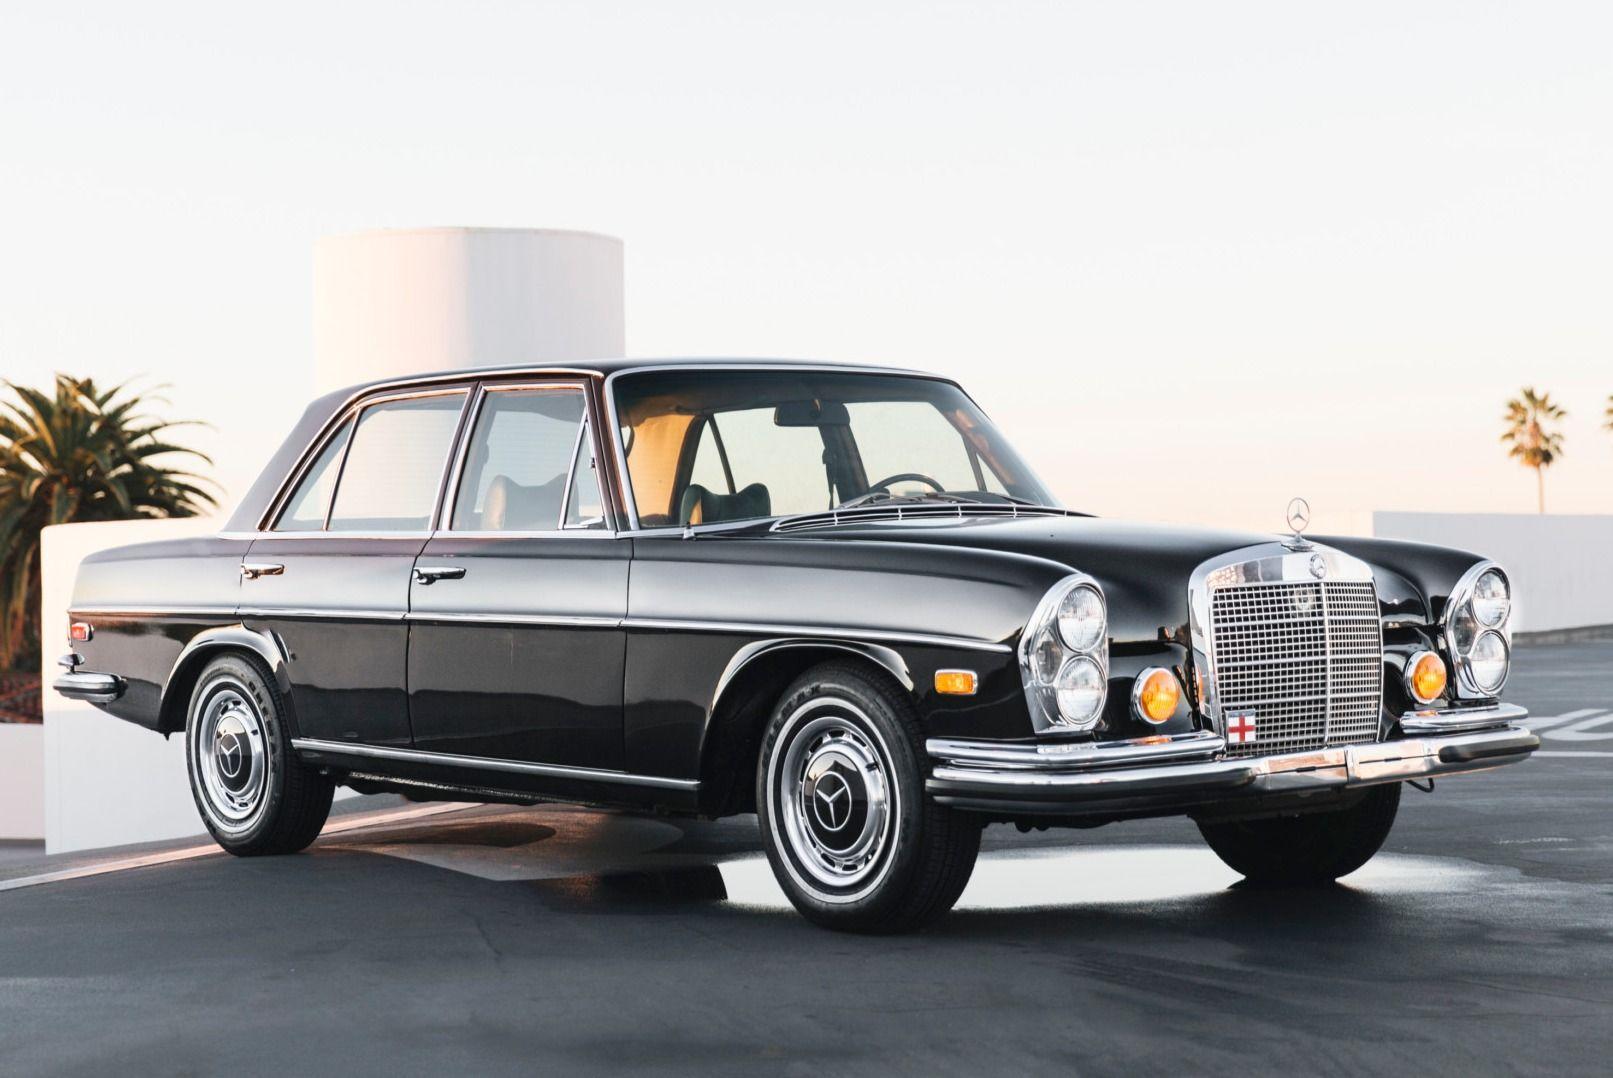 No Reserve 1973 Mercedes Benz 280se 4 5 In 2020 Classic Mercedes Mercedes Benz Mercedes Benz Classic